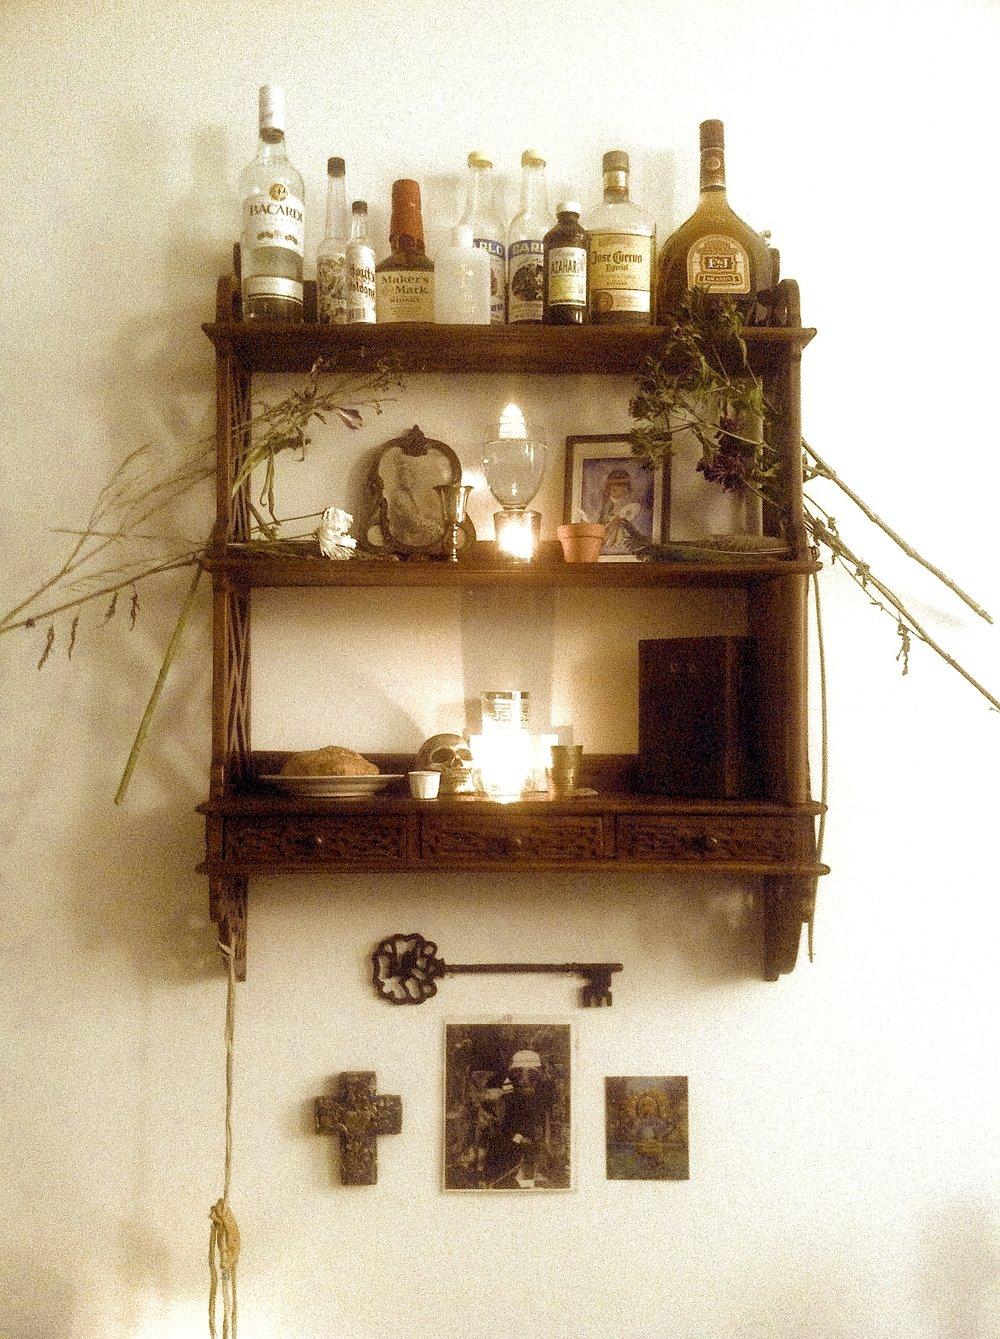 A shrine honoring biological ancestors and ancestors of lineage